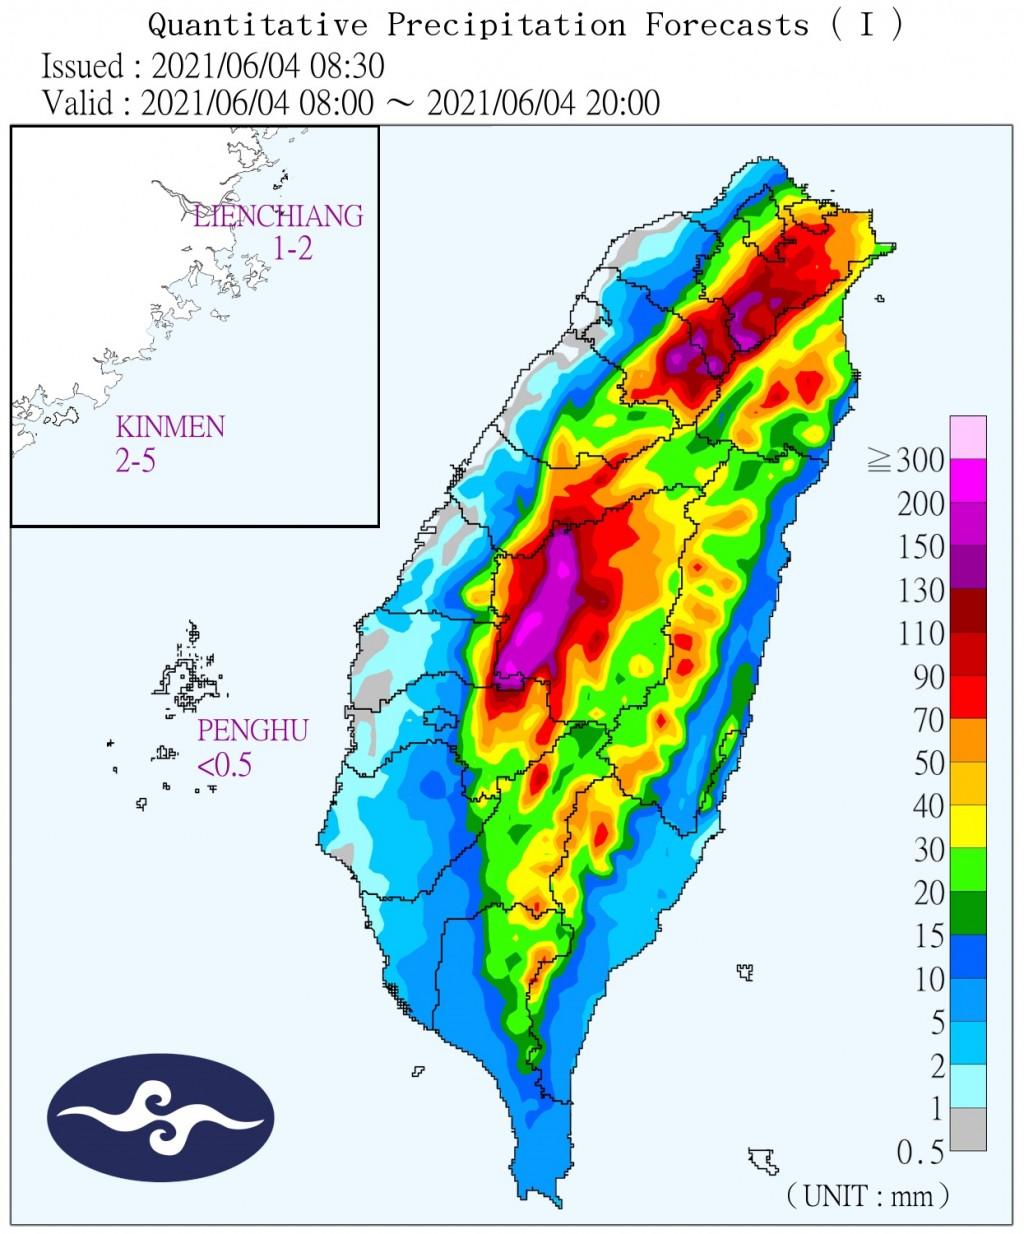 Taiwan issues land, sea warnings for Tropical Storm Choi-wan